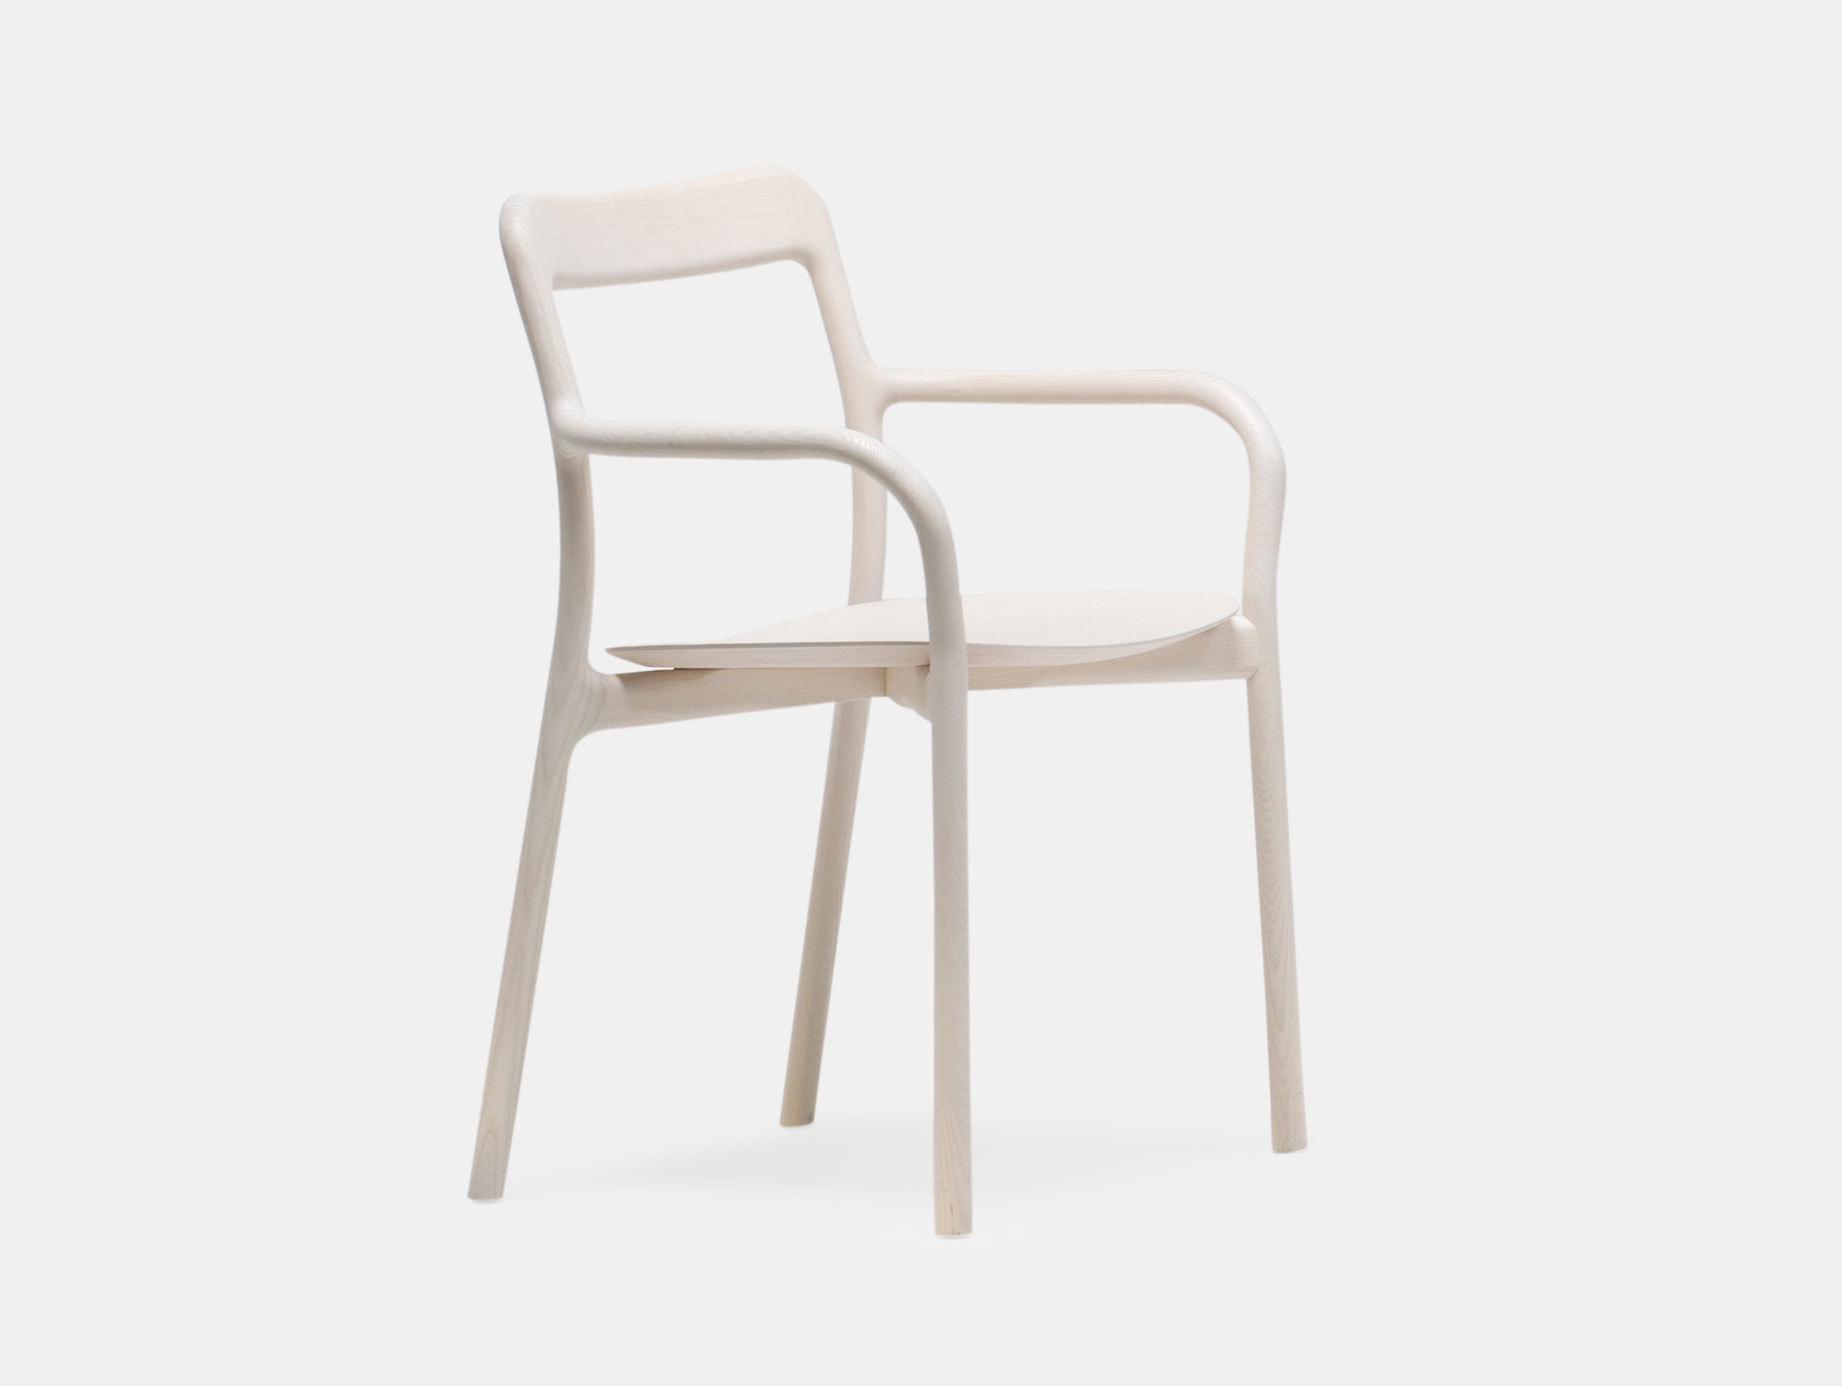 Branca Chair image 3